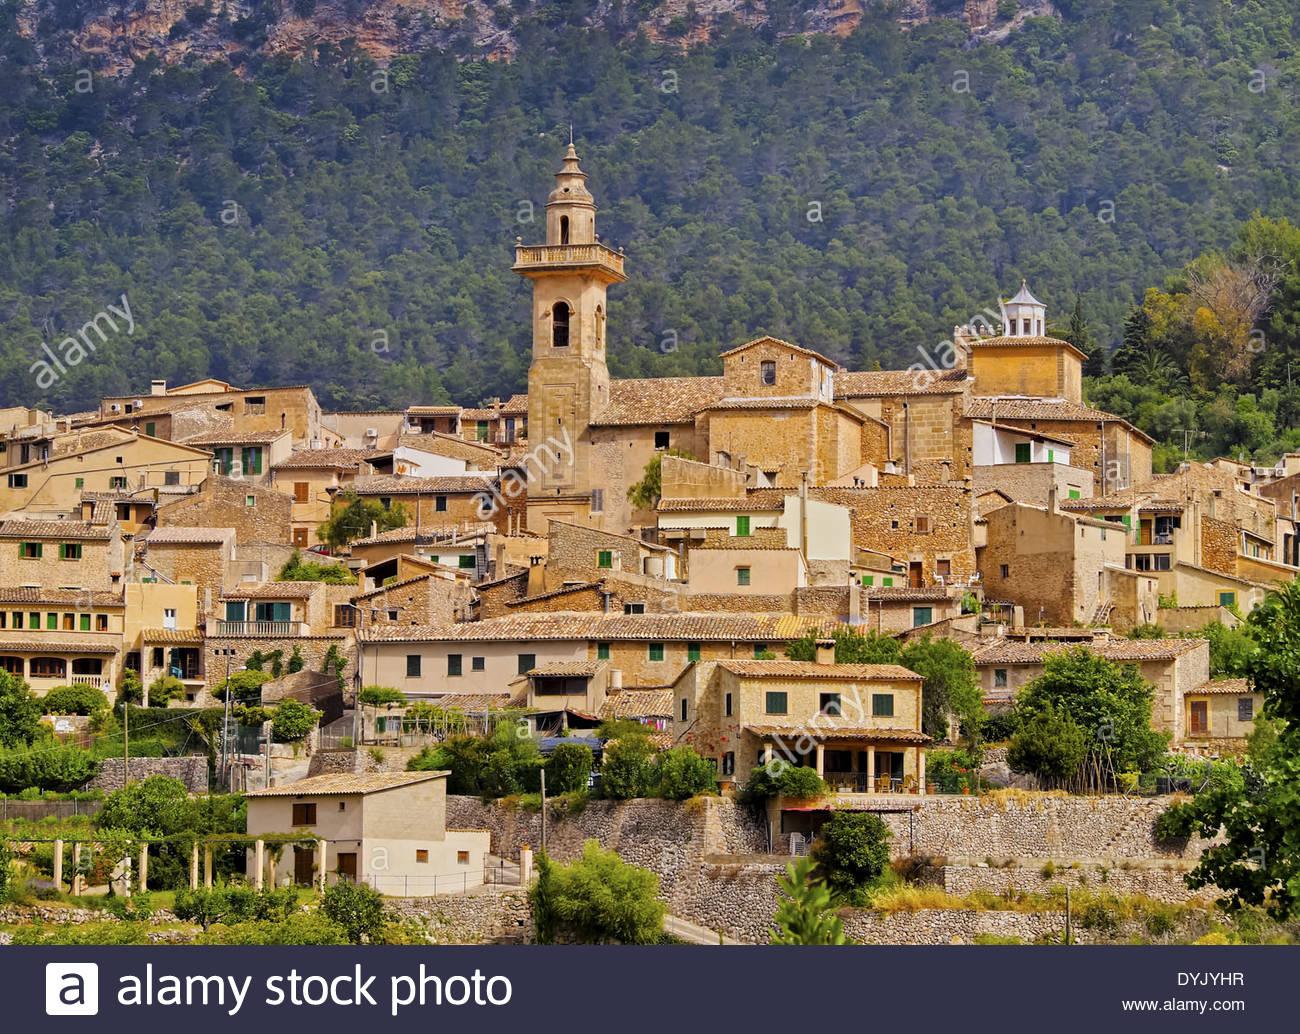 View of Valldemossa on Mallorca, Balearic Islands, Spain Stock Photo